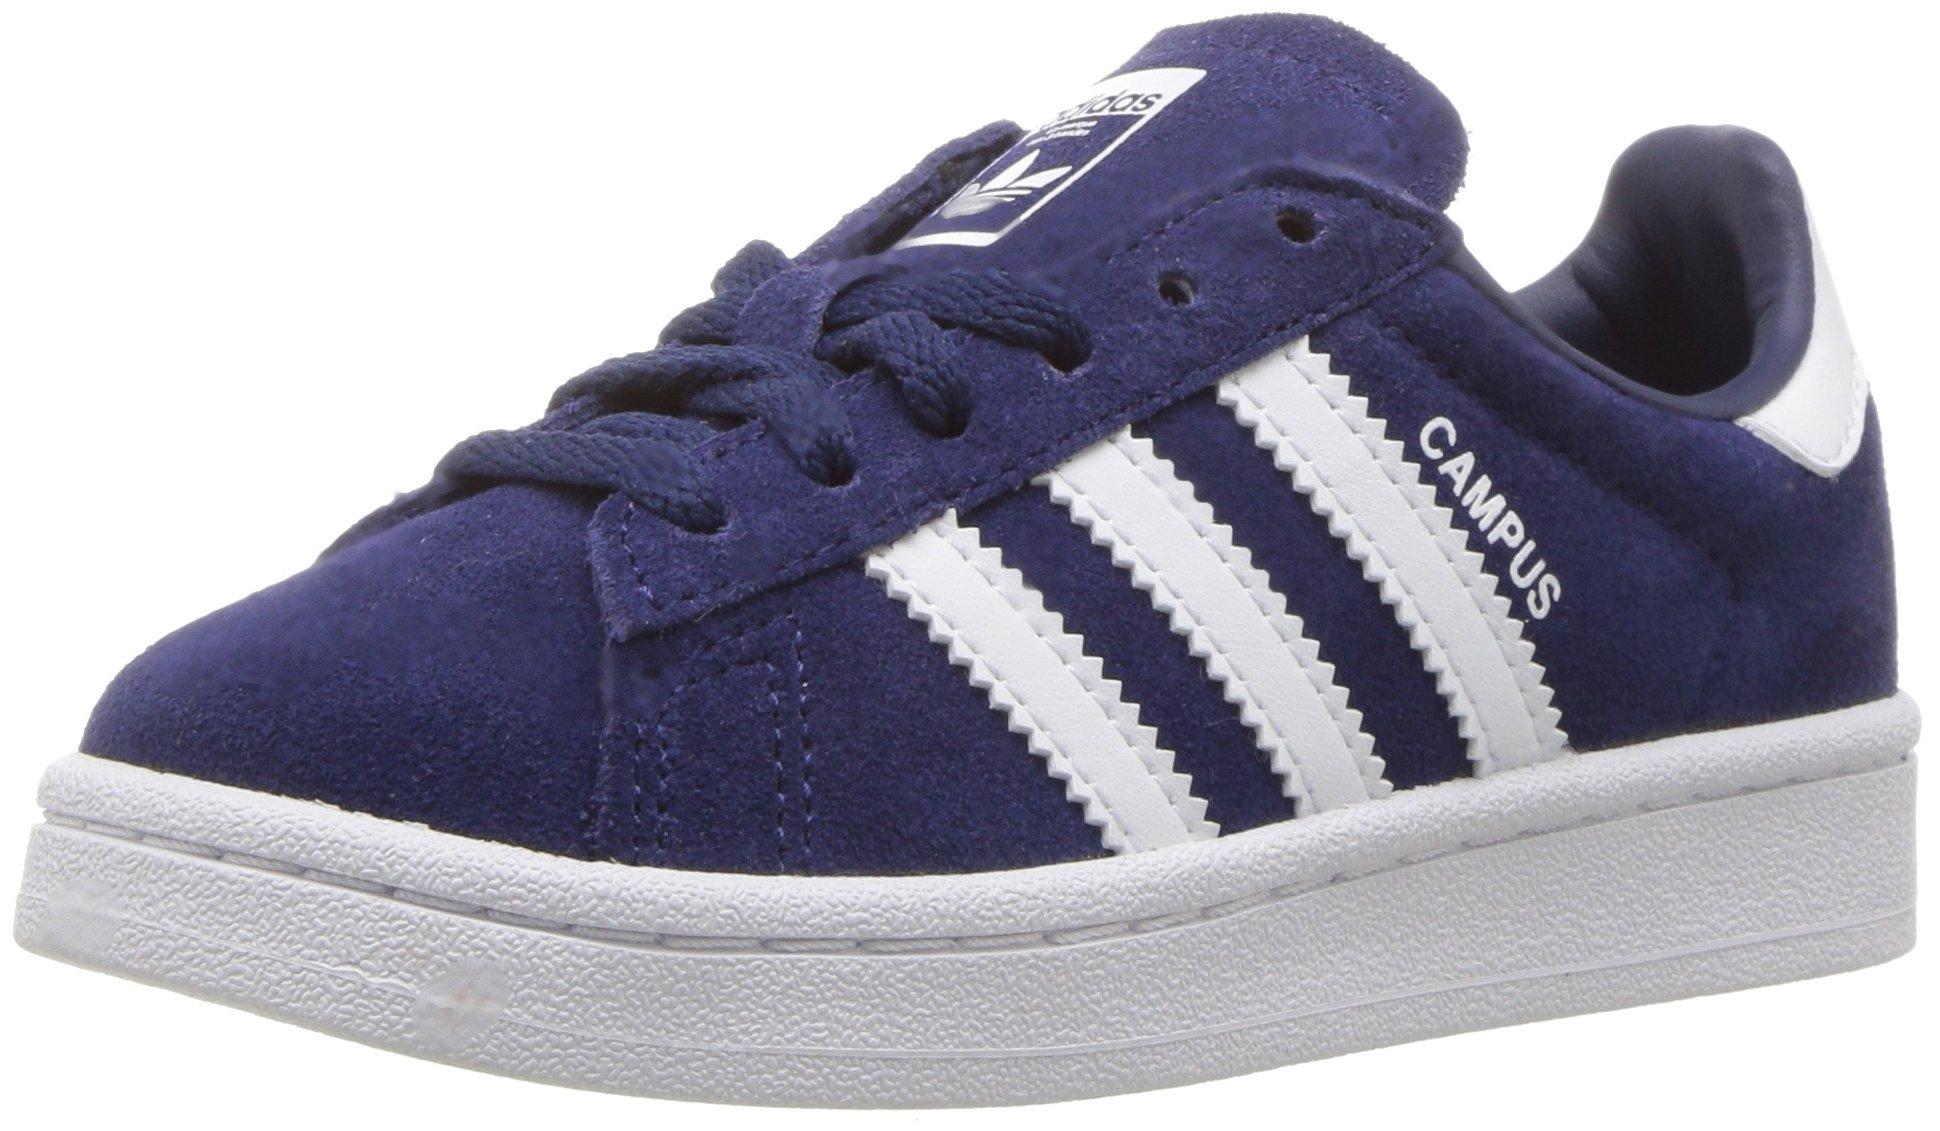 adidas Originals Boys' Campus C Sneaker, Dark Blue White, 13.5 Medium US Little Kid